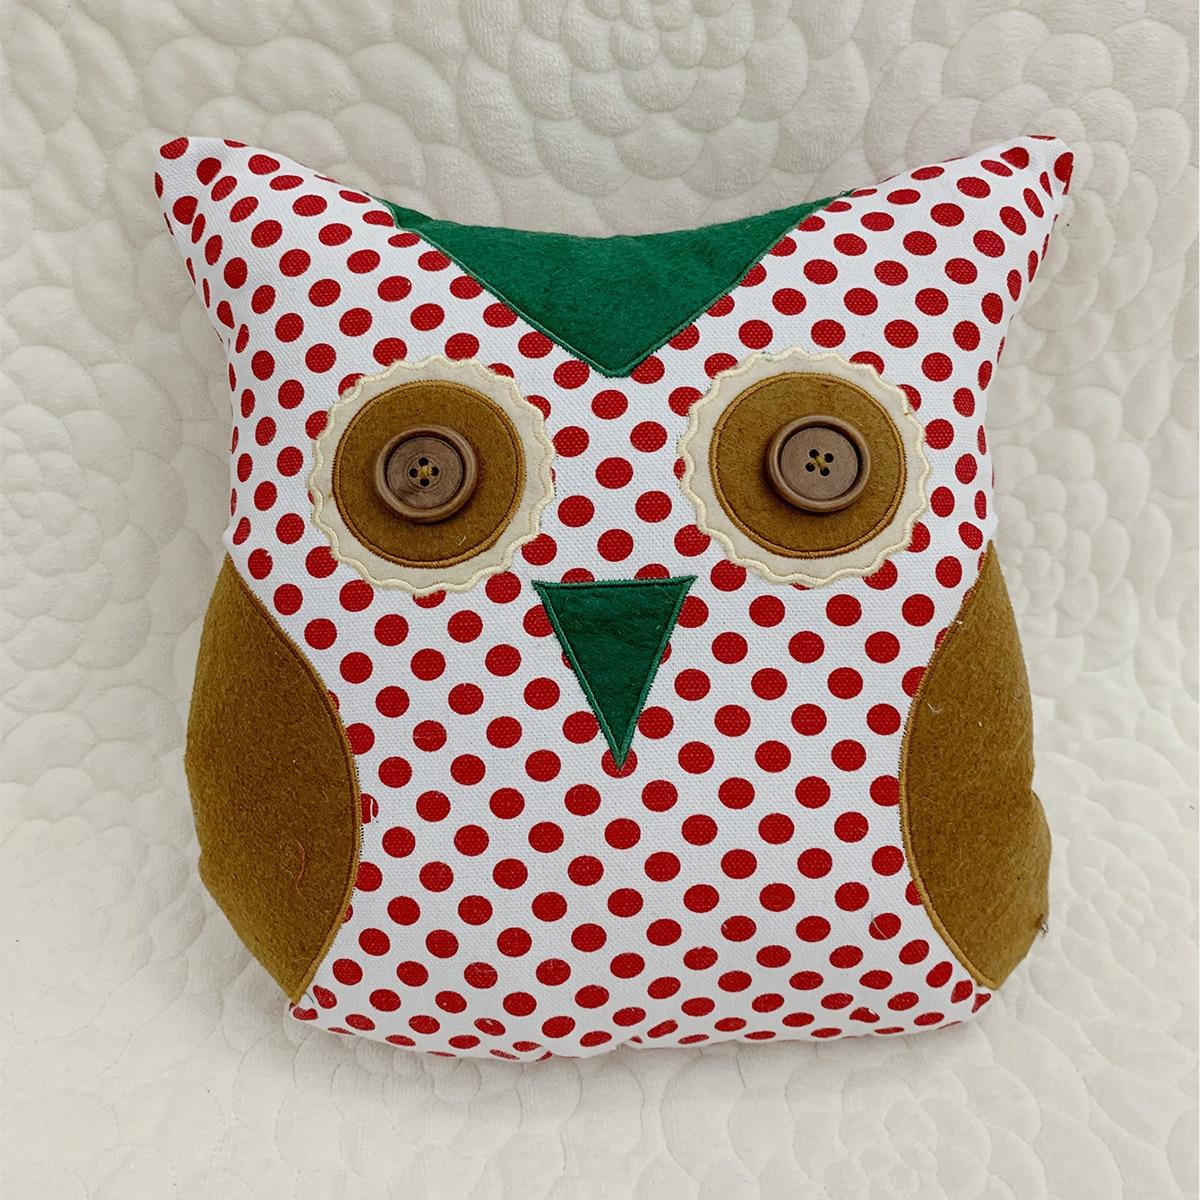 Декоративная подушка сова в форме